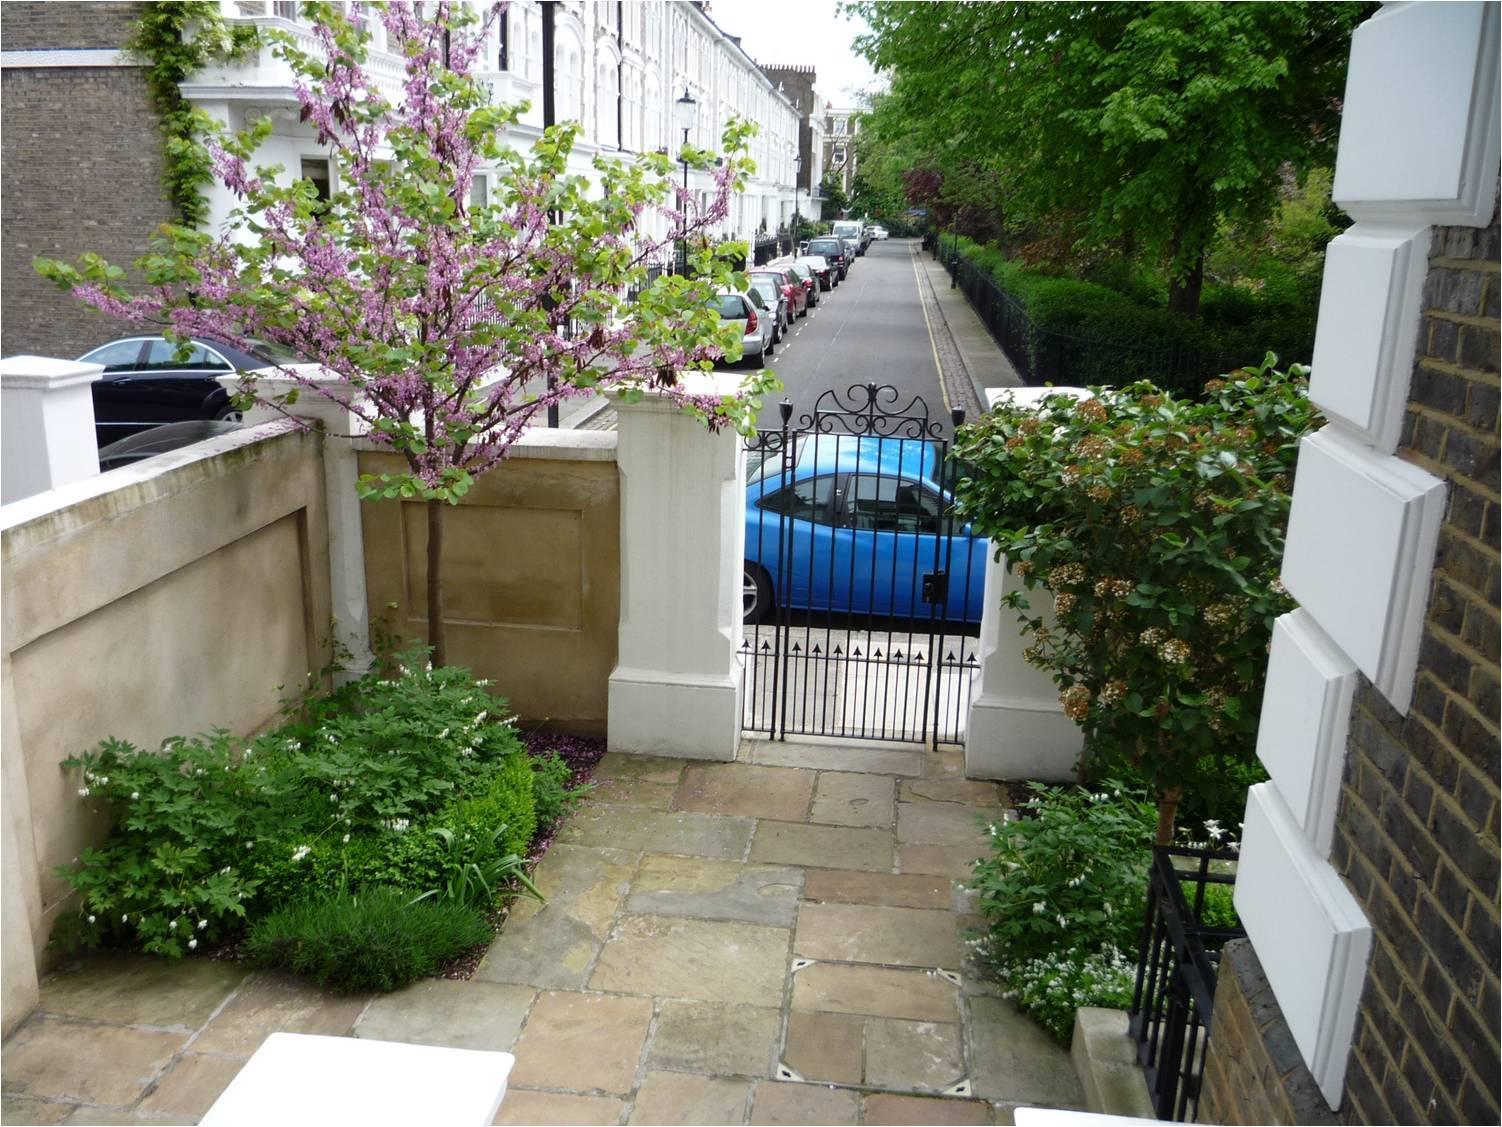 Arquitectura de casas jardines peque os en entradas a for Casas para jardin baratas